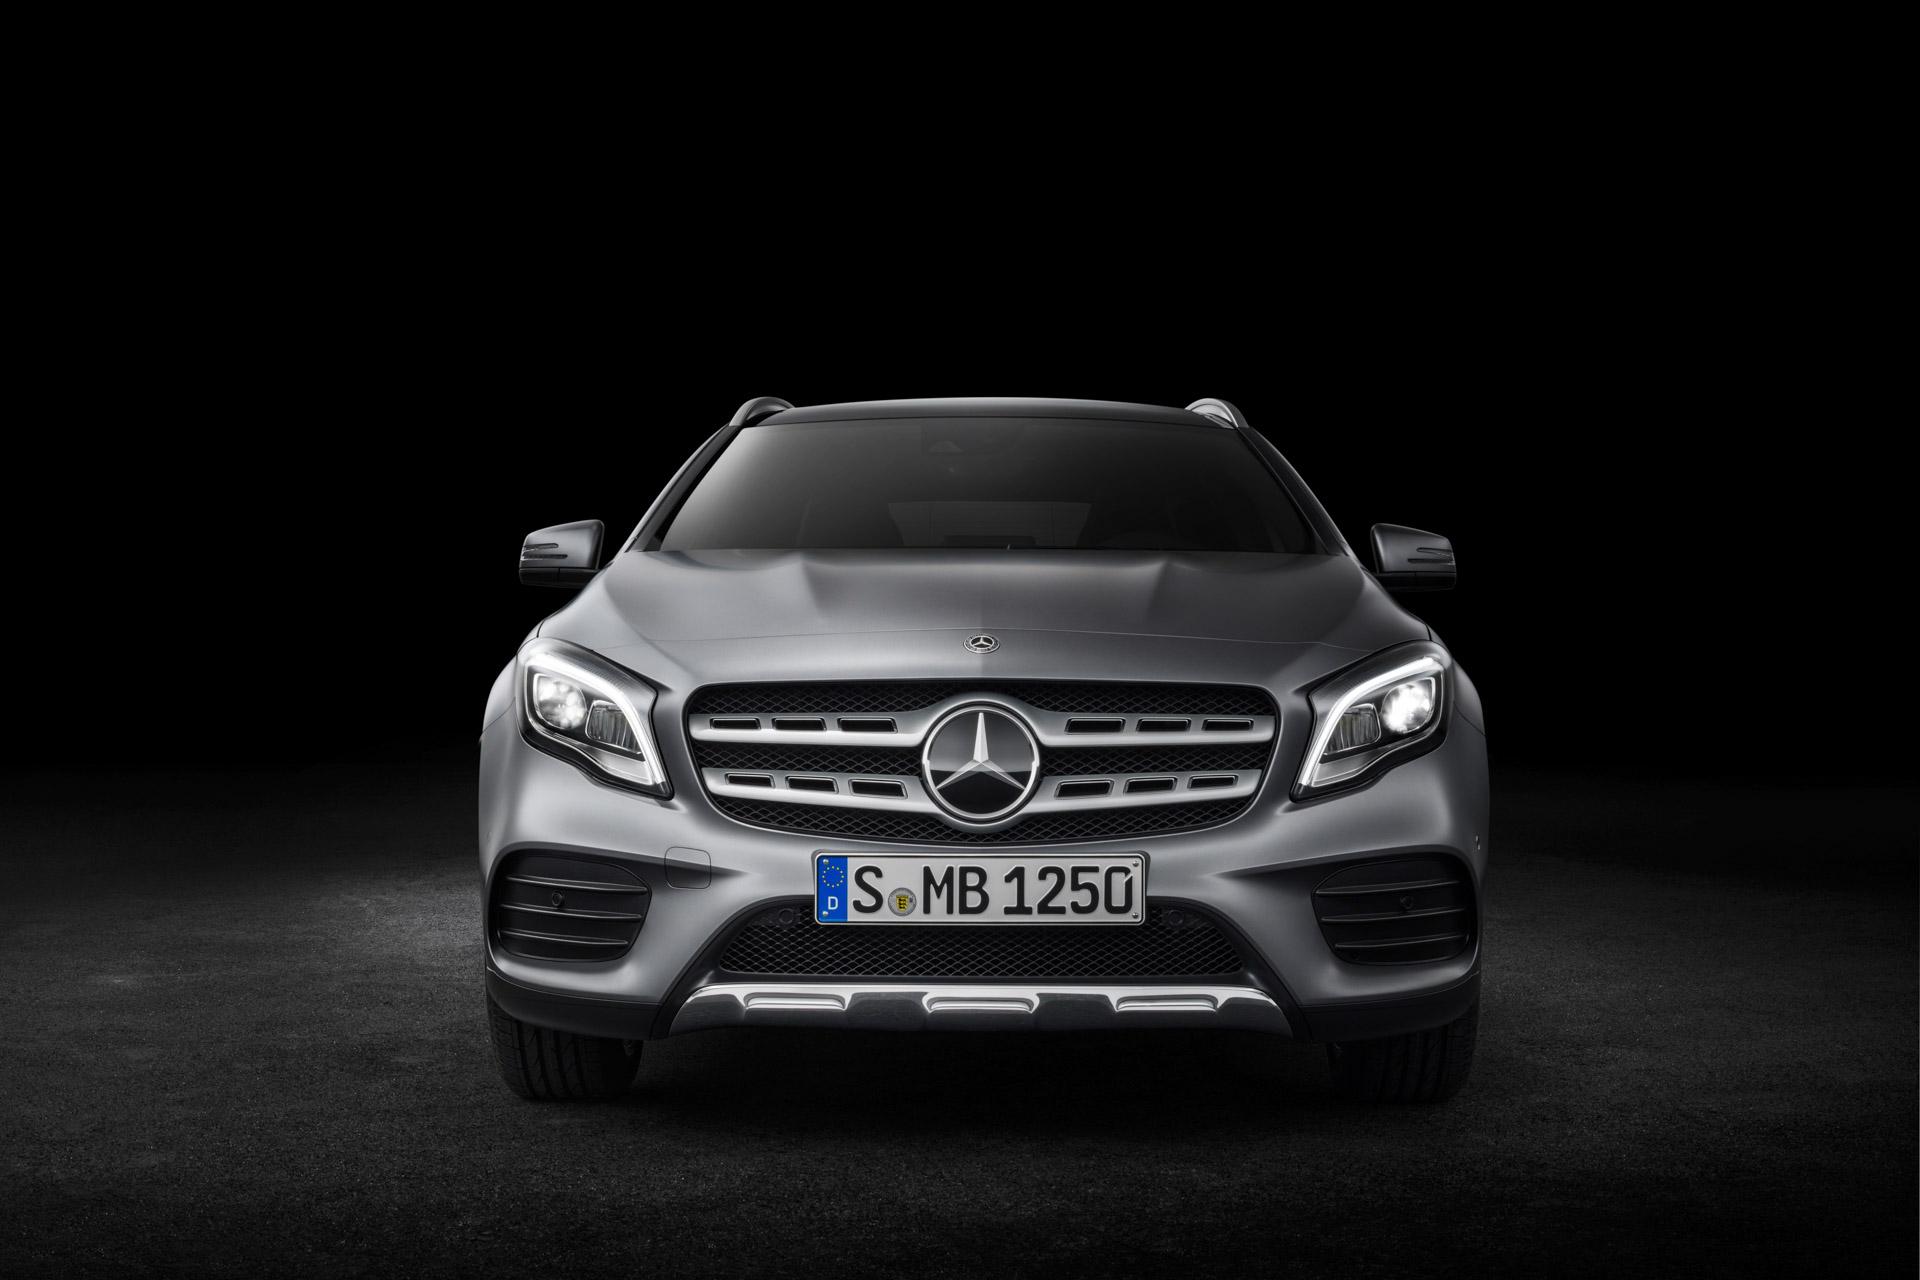 Mercedes-Benz GLA 250 4MATIC, AMG Line, Mountaingrau magno, Studioaufnahme ;Kraftstoffverbrauch kombiniert: 6,5 l/100 km, CO2-Emissionen kombiniert: 152 g/km Mercedes-Benz GLA 250 4MATIC, AMG Line, mountain grey magno, studio shot; Fuel consumption combined:  6.5 l/100 km; Combined CO2 emissions: 152 g/km